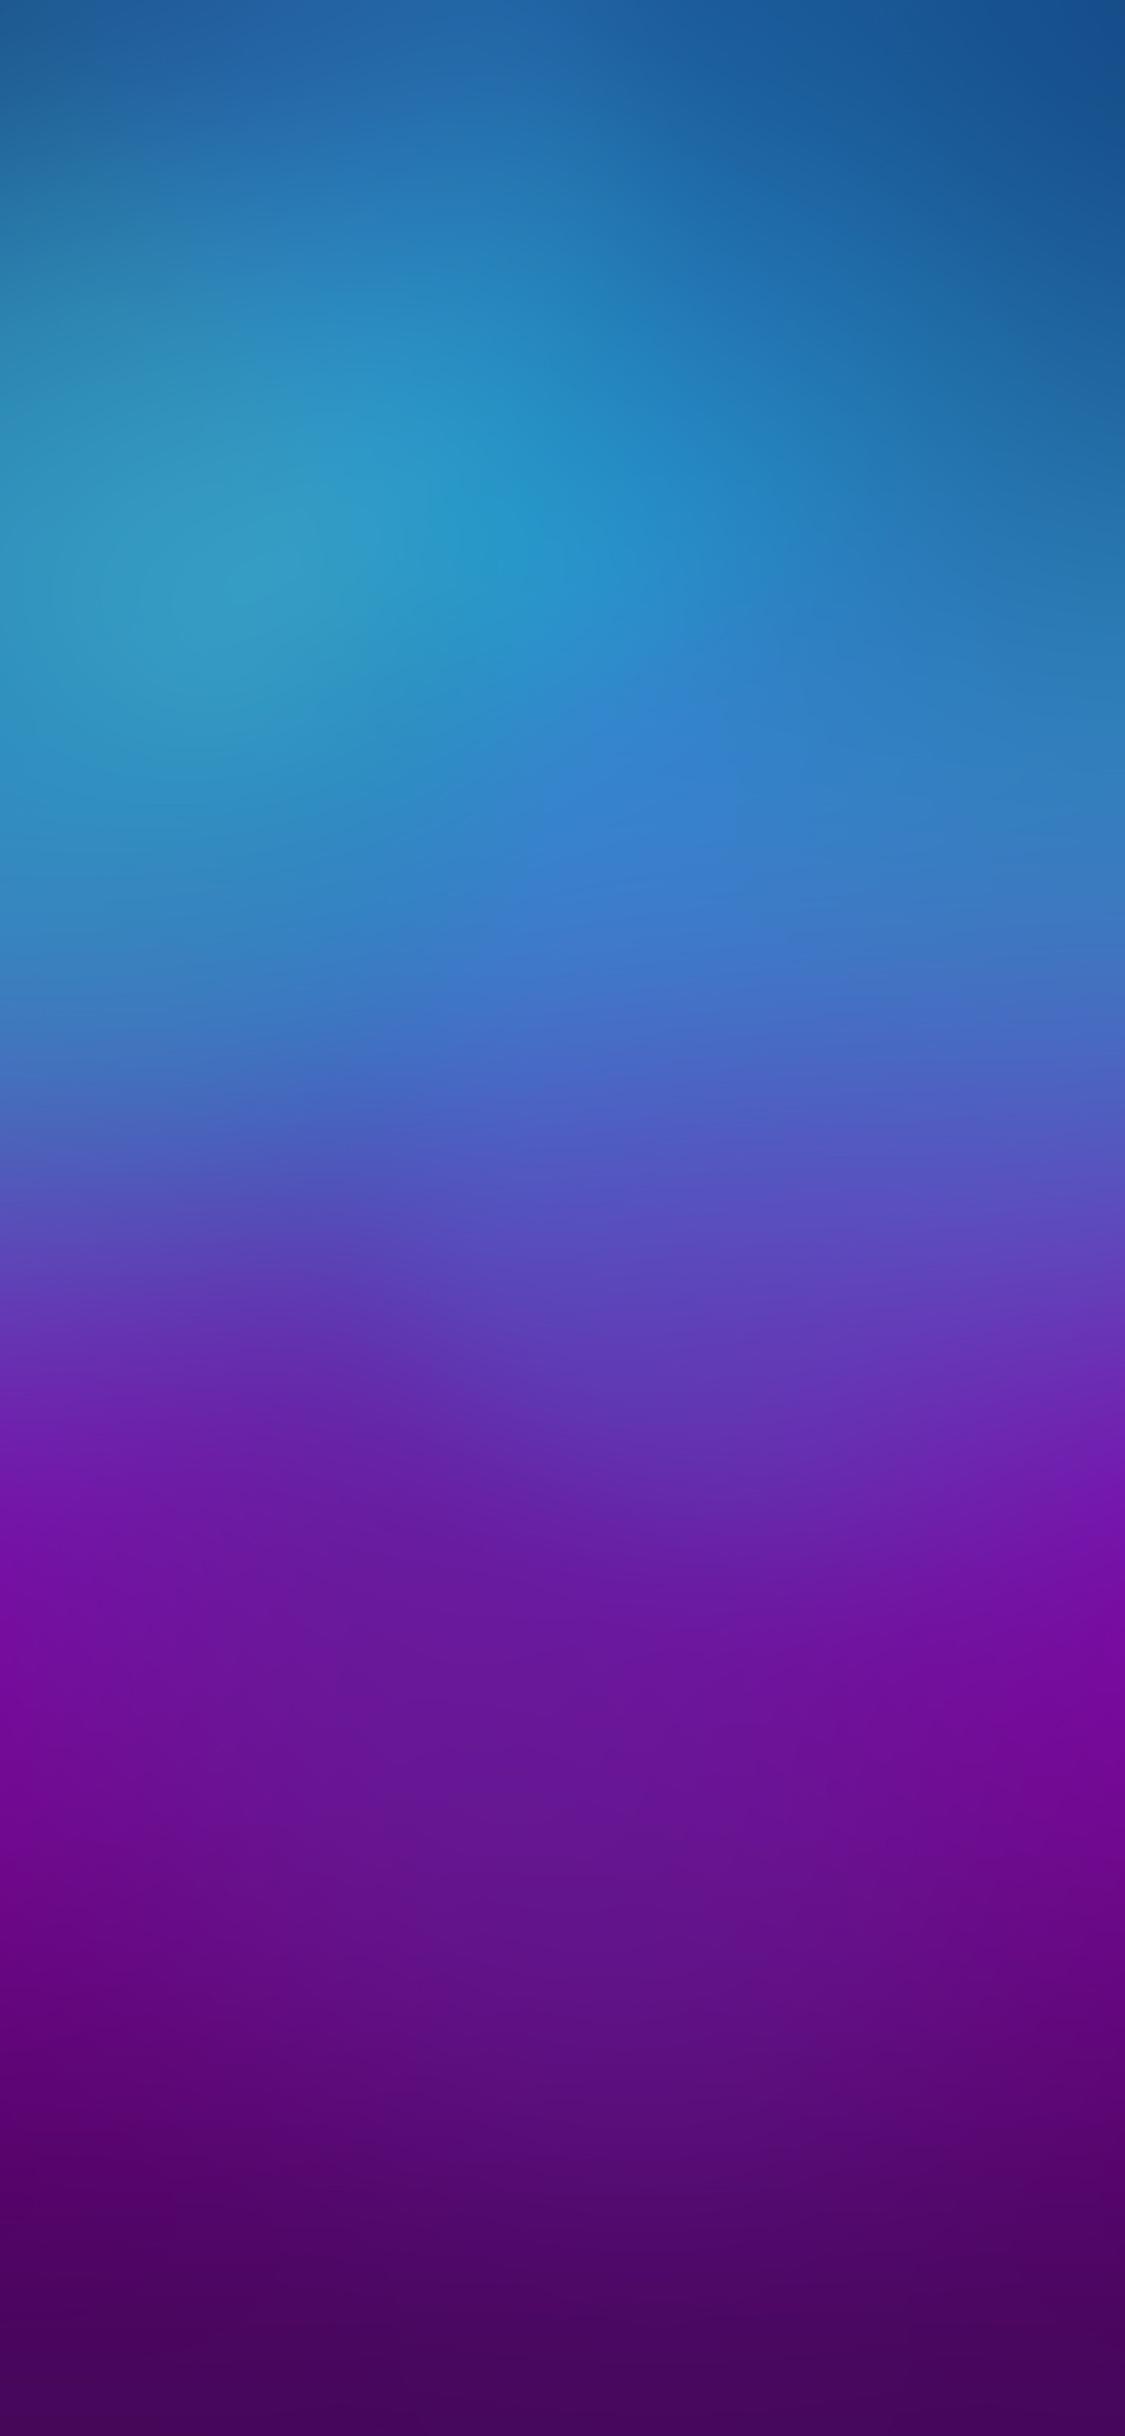 iPhoneXpapers.com-Apple-iPhone-wallpaper-sf69-purple-blue-hippo-lake-gradation-blur